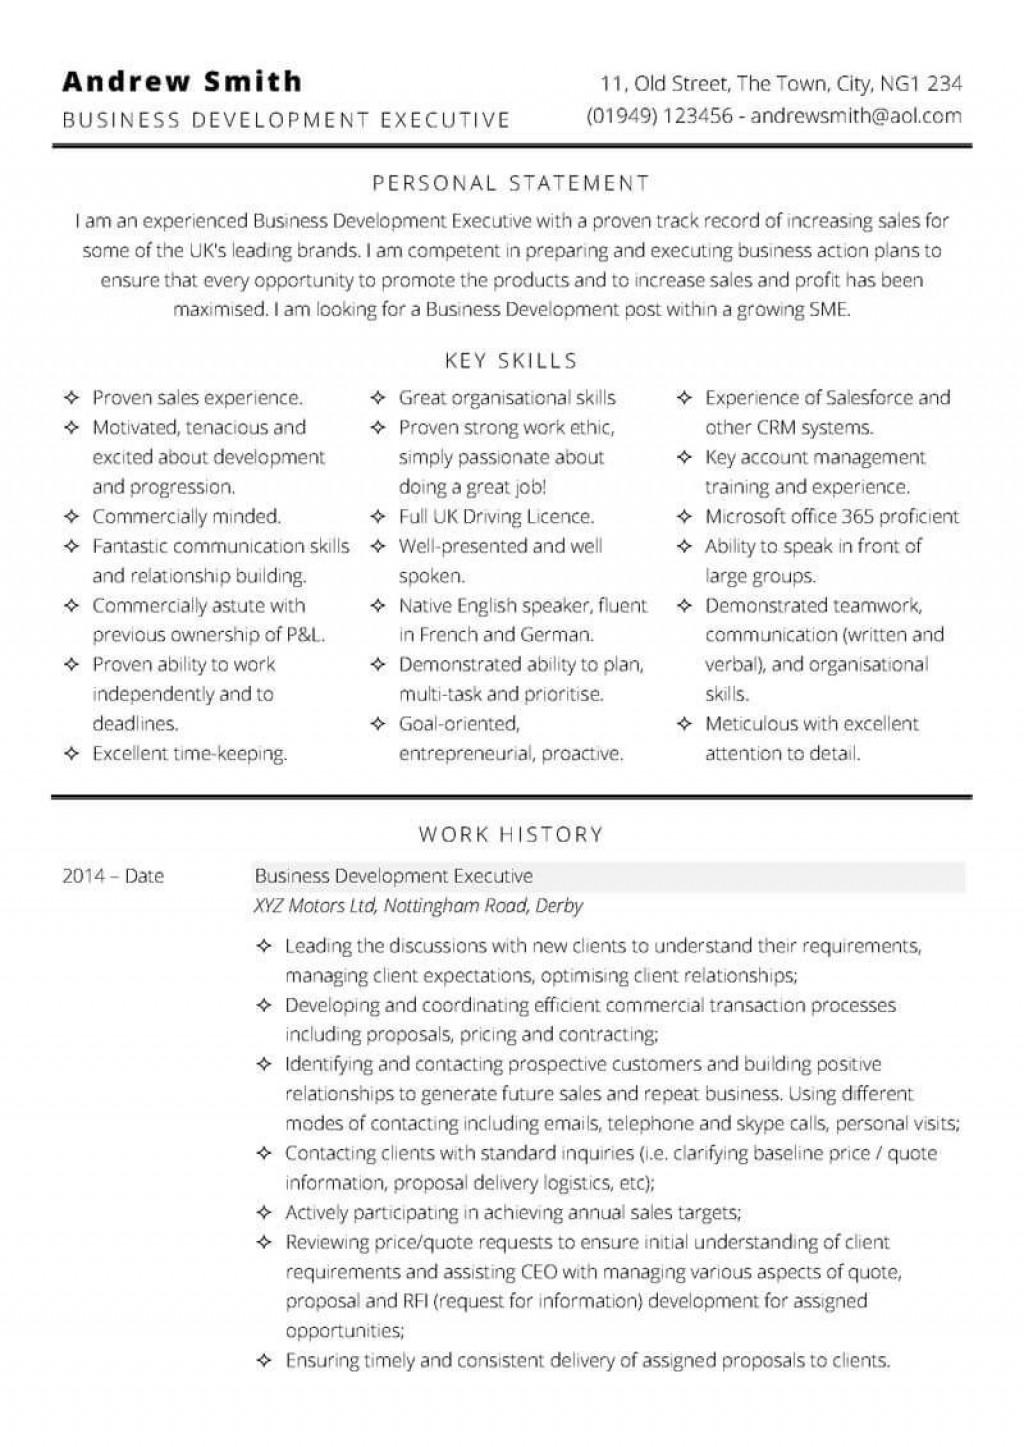 003 Fascinating Skill Based Resume Template Word High Def  MicrosoftLarge